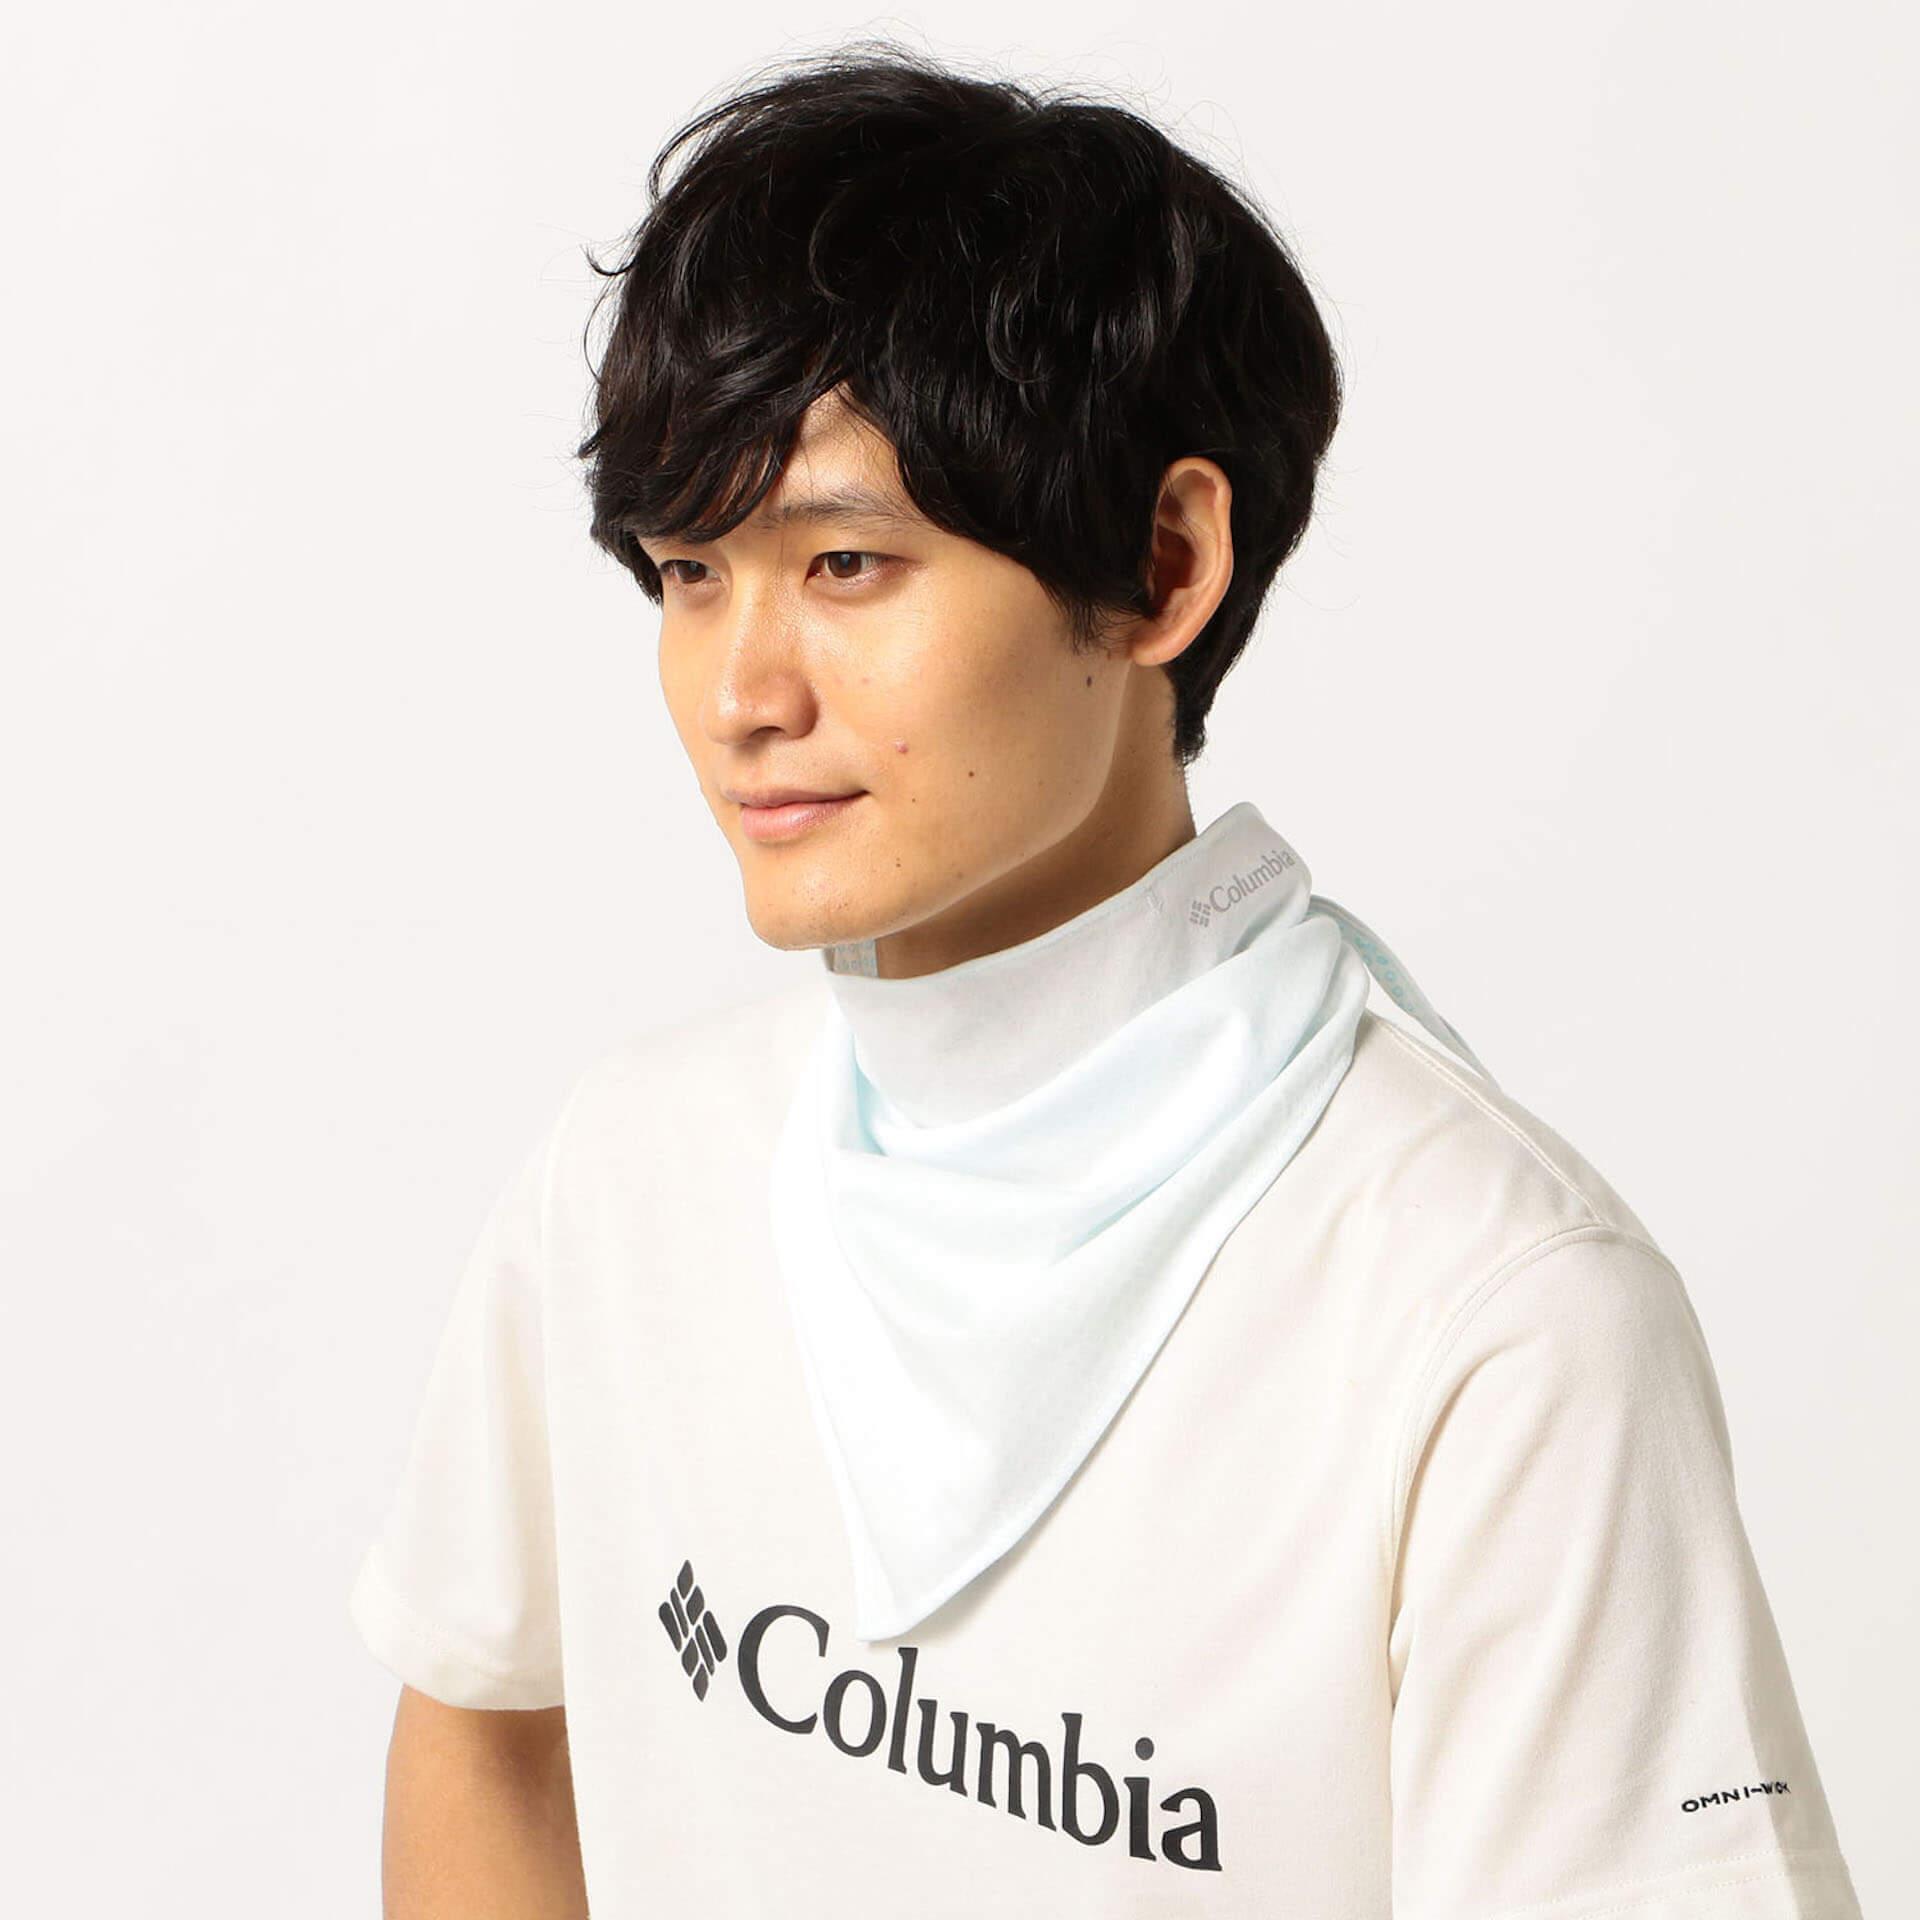 Columbiaからマスクがわりにも最適なネックガード2種が発売決定!汗が冷却効果をもたらす「オムニフリーズゼロ」搭載 life200721_columbia_mask_5